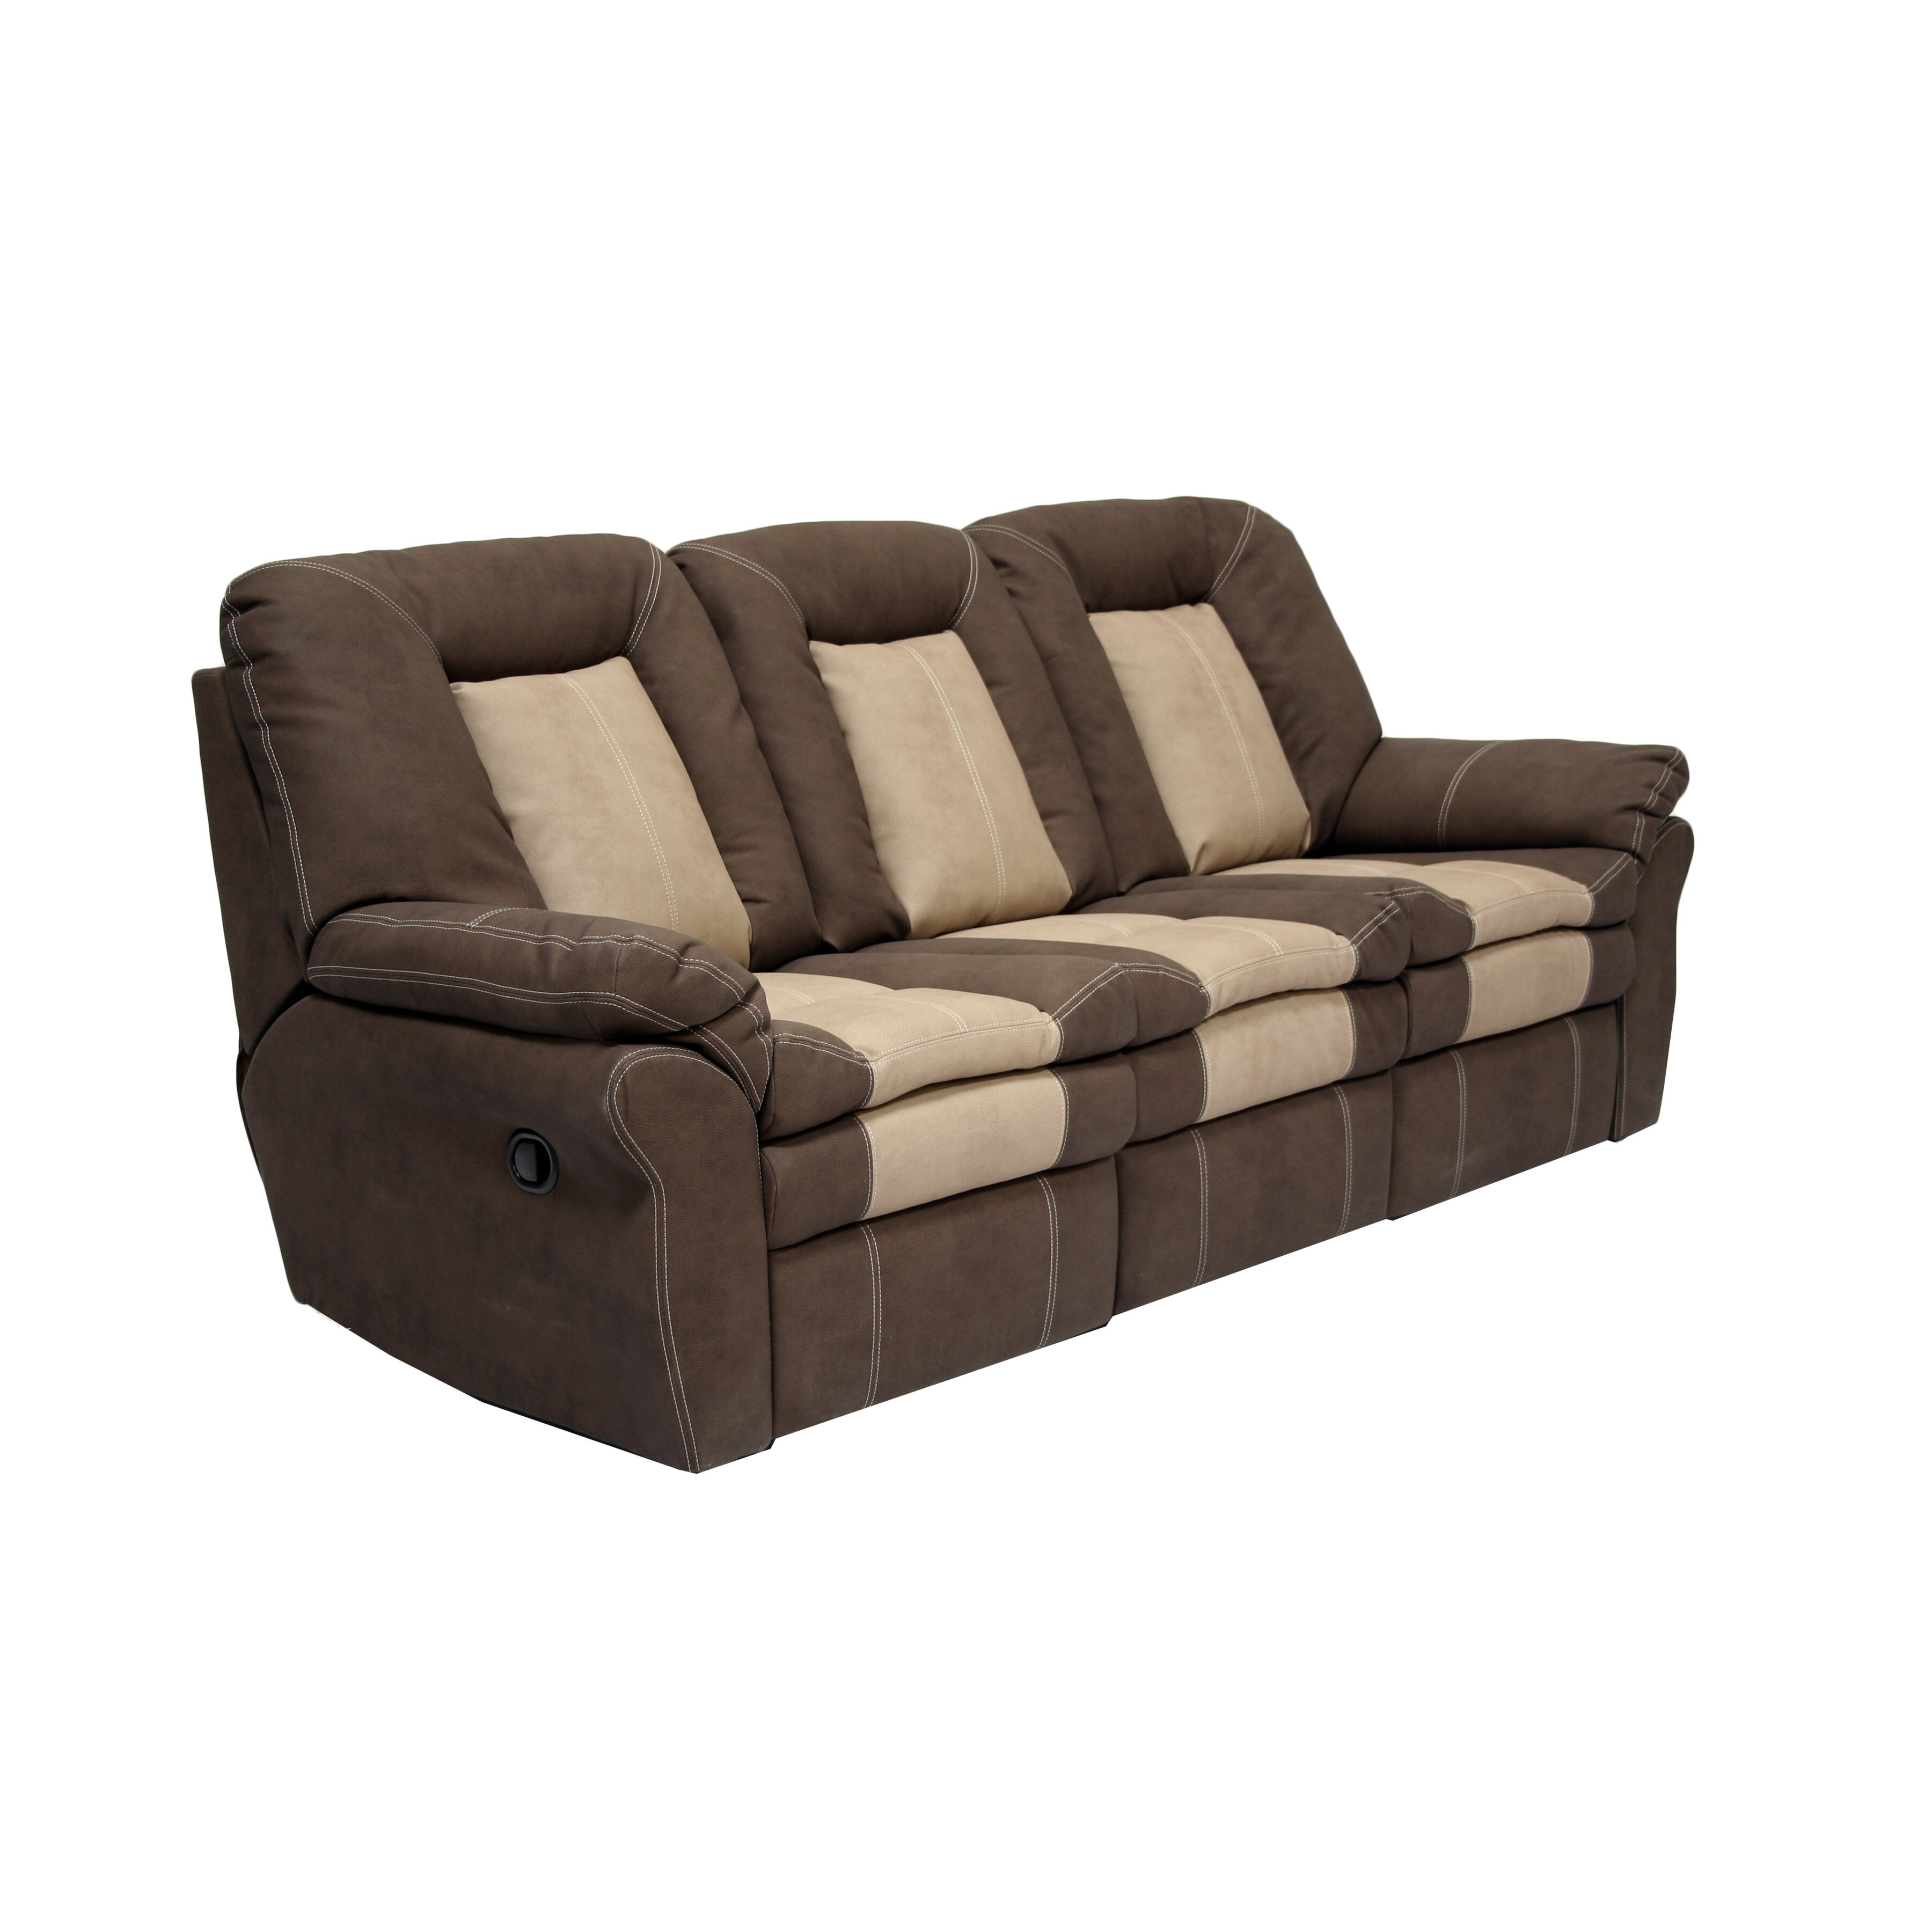 Ac Pacific Carson Plush Living Room Dual Reclining Sofa Wayfair